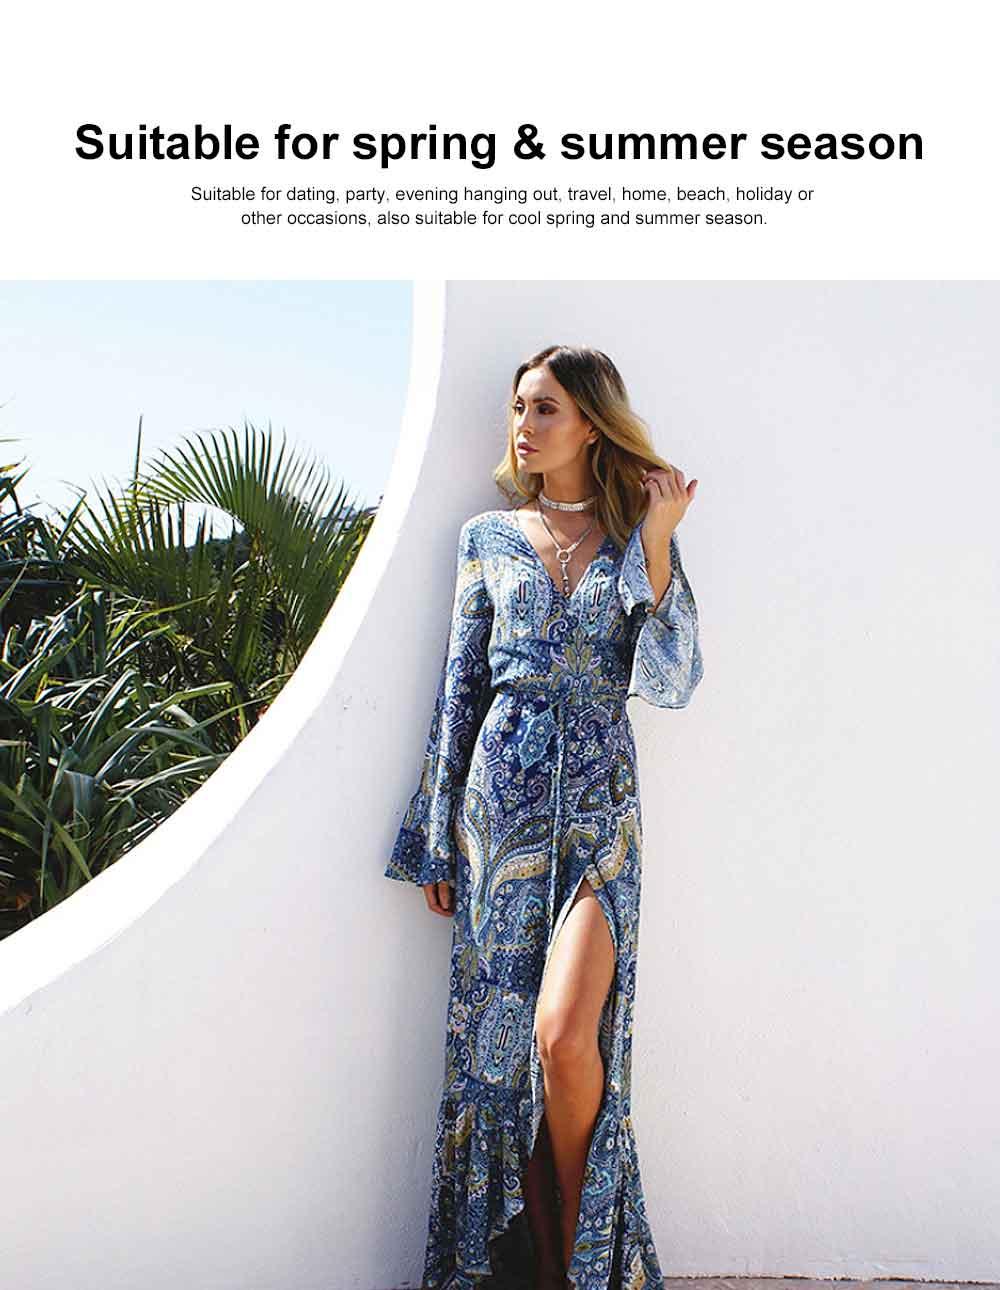 Women Large Size Long Dress, Floral Printed Maxi Dress Deep V-neck Irregular Dresses, Beach Dresses Bohemian Side Split Dresses 3